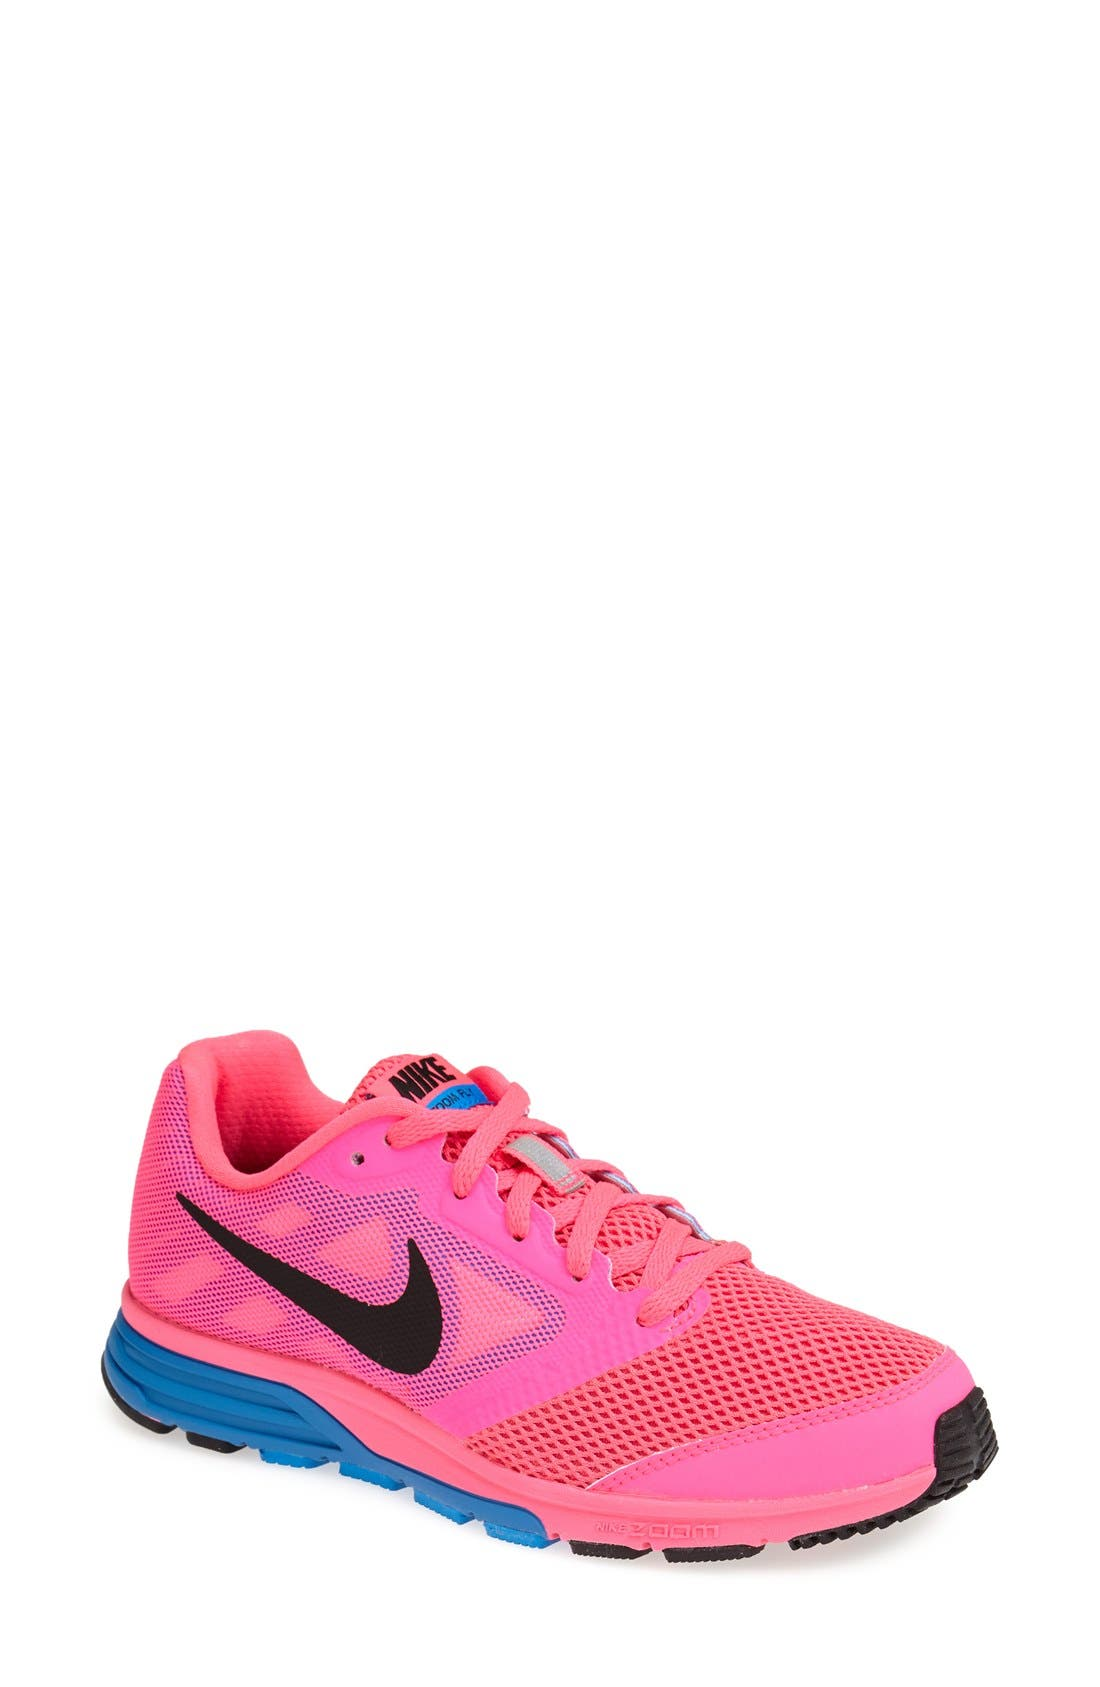 Main Image - Nike 'Zoom Fly' Running Shoe (Women)